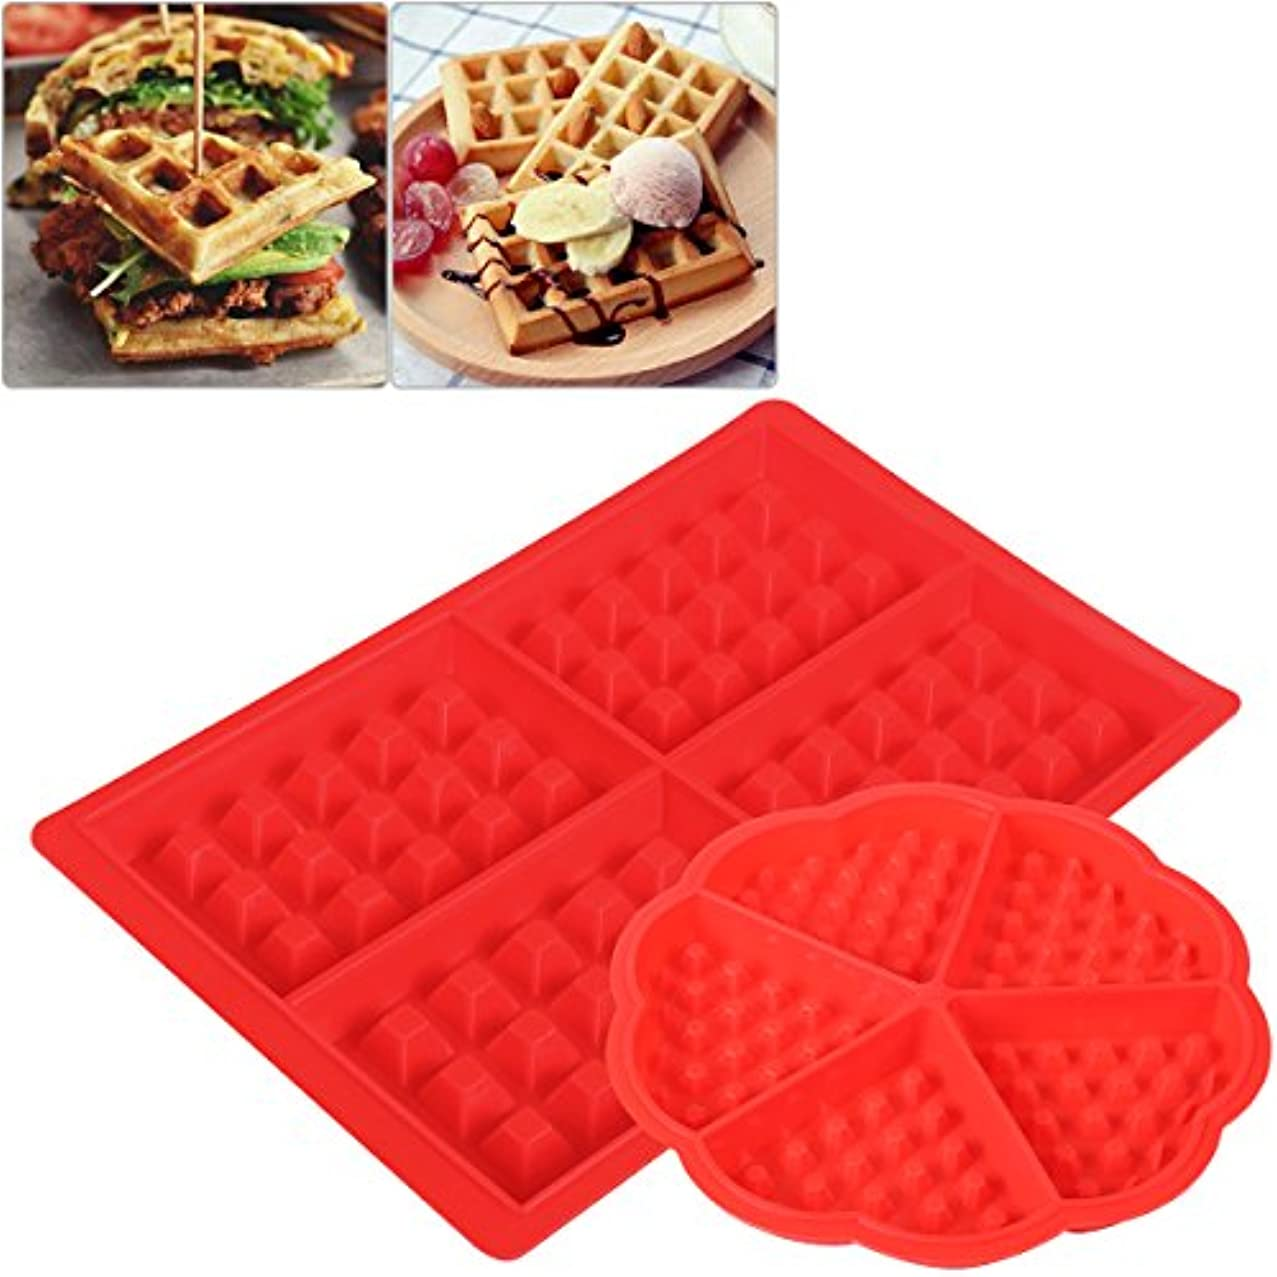 OUNONA 2Pcs Silicone Waffle Mould Heart Shaped Waffle Maker Chocolate Mold Square Heart Shape